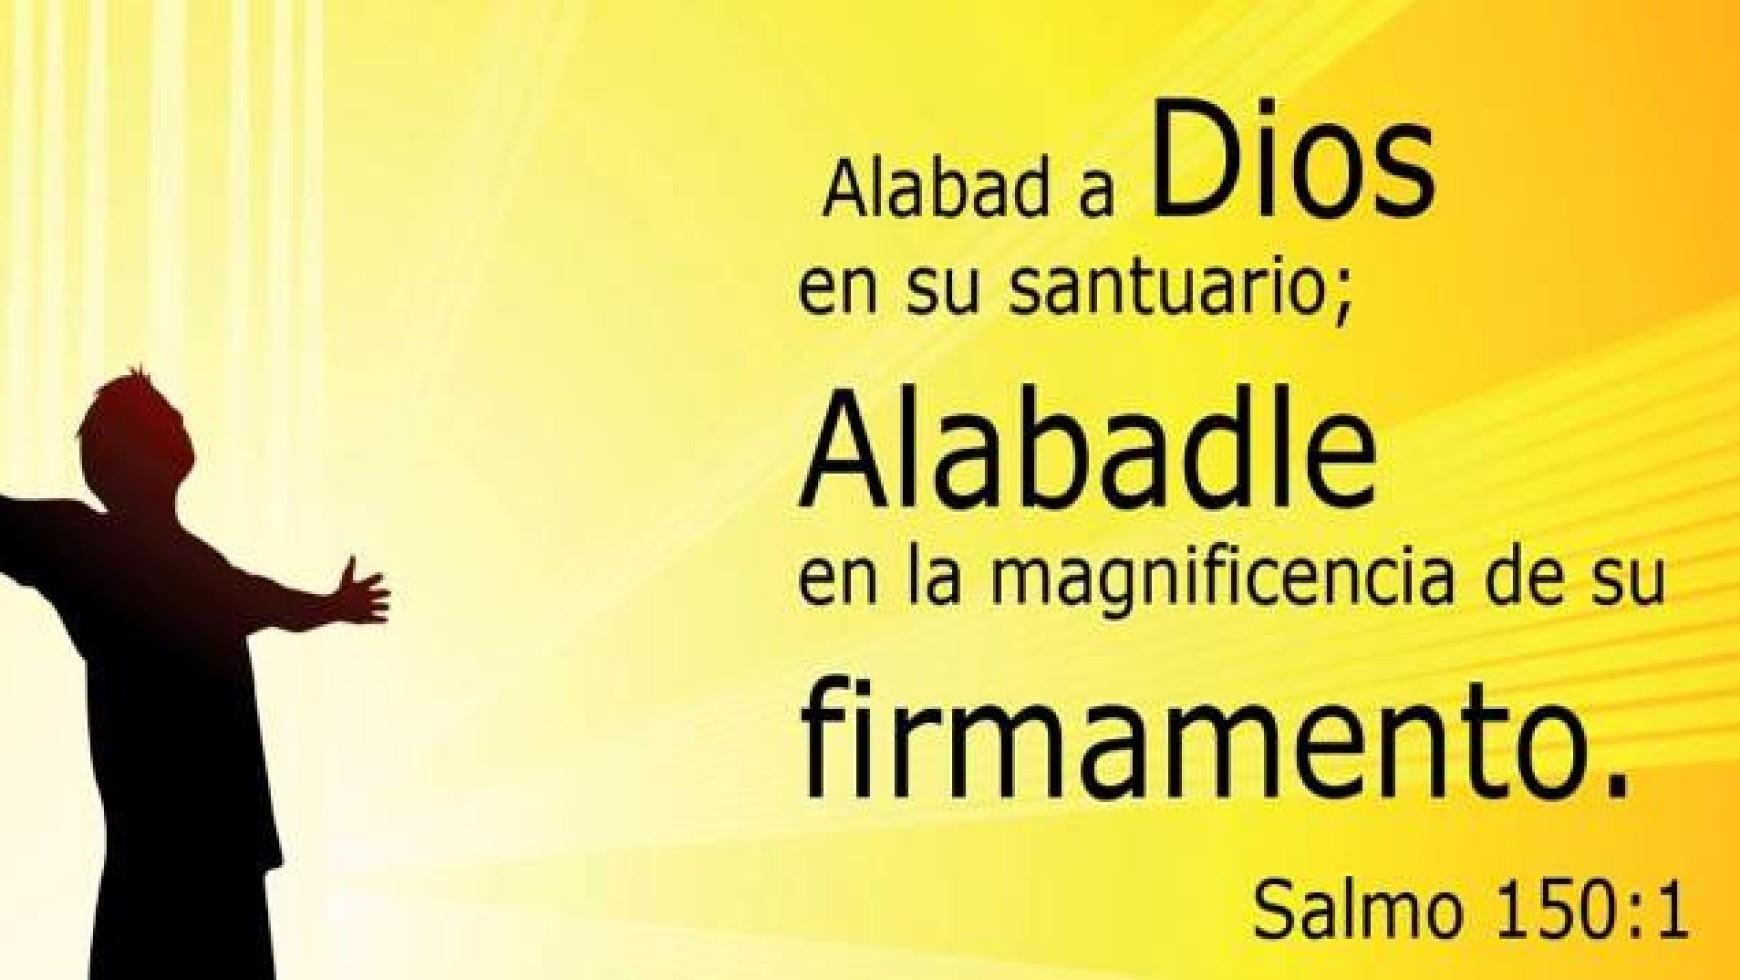 Boletin: No desviarnos de Jesus (28/06/2015)